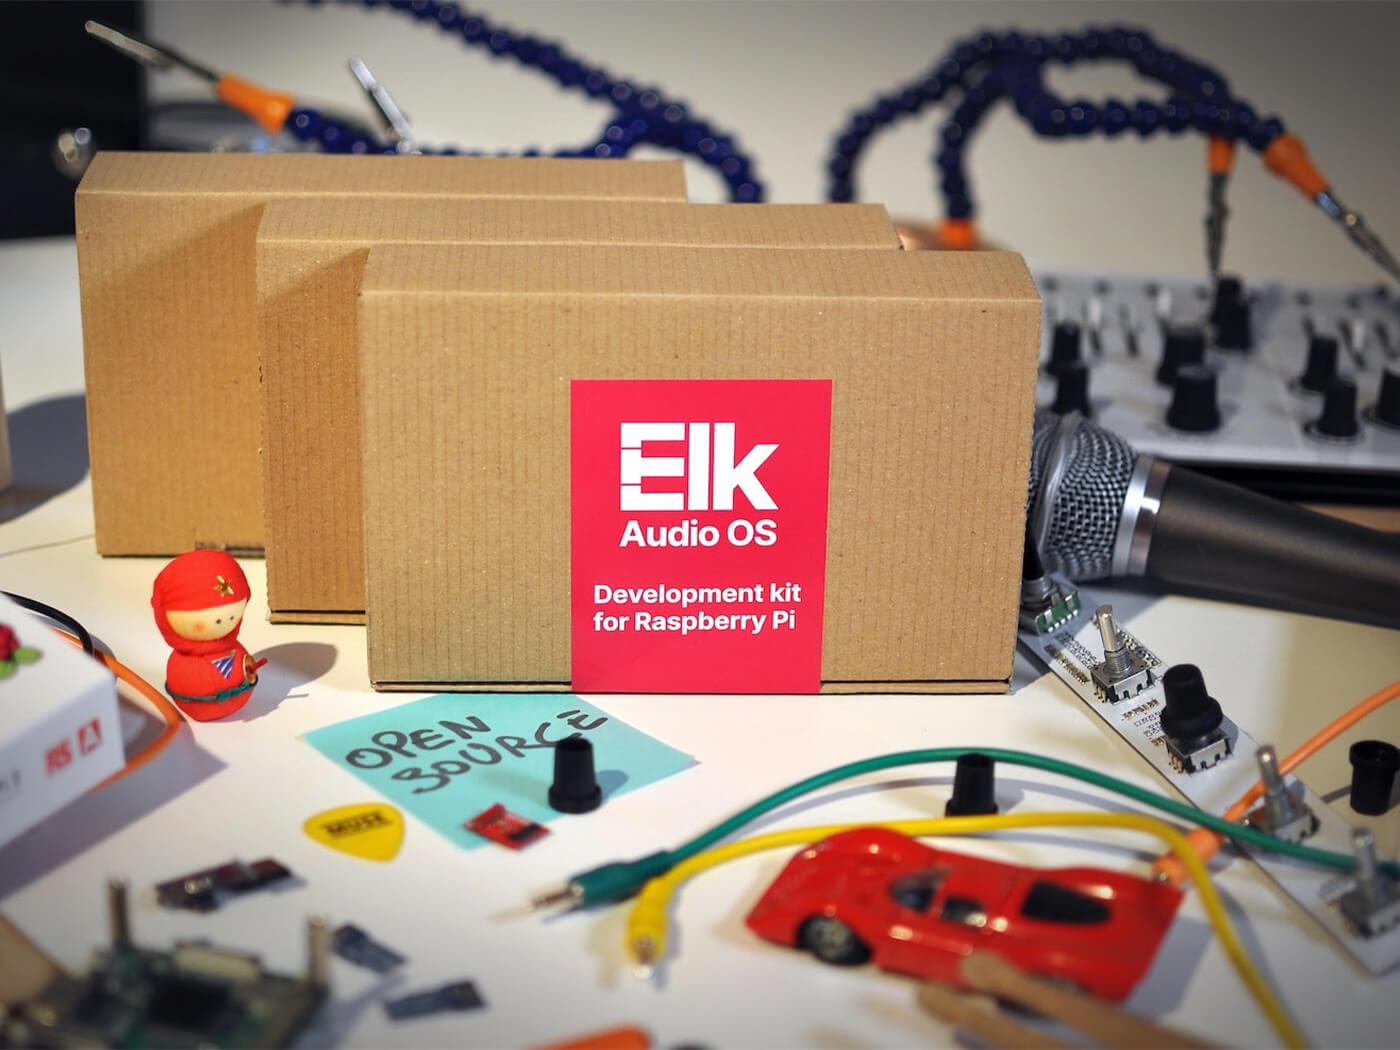 Elk Audio OS goes open source with a Raspberry Pi development kit - MusicTech